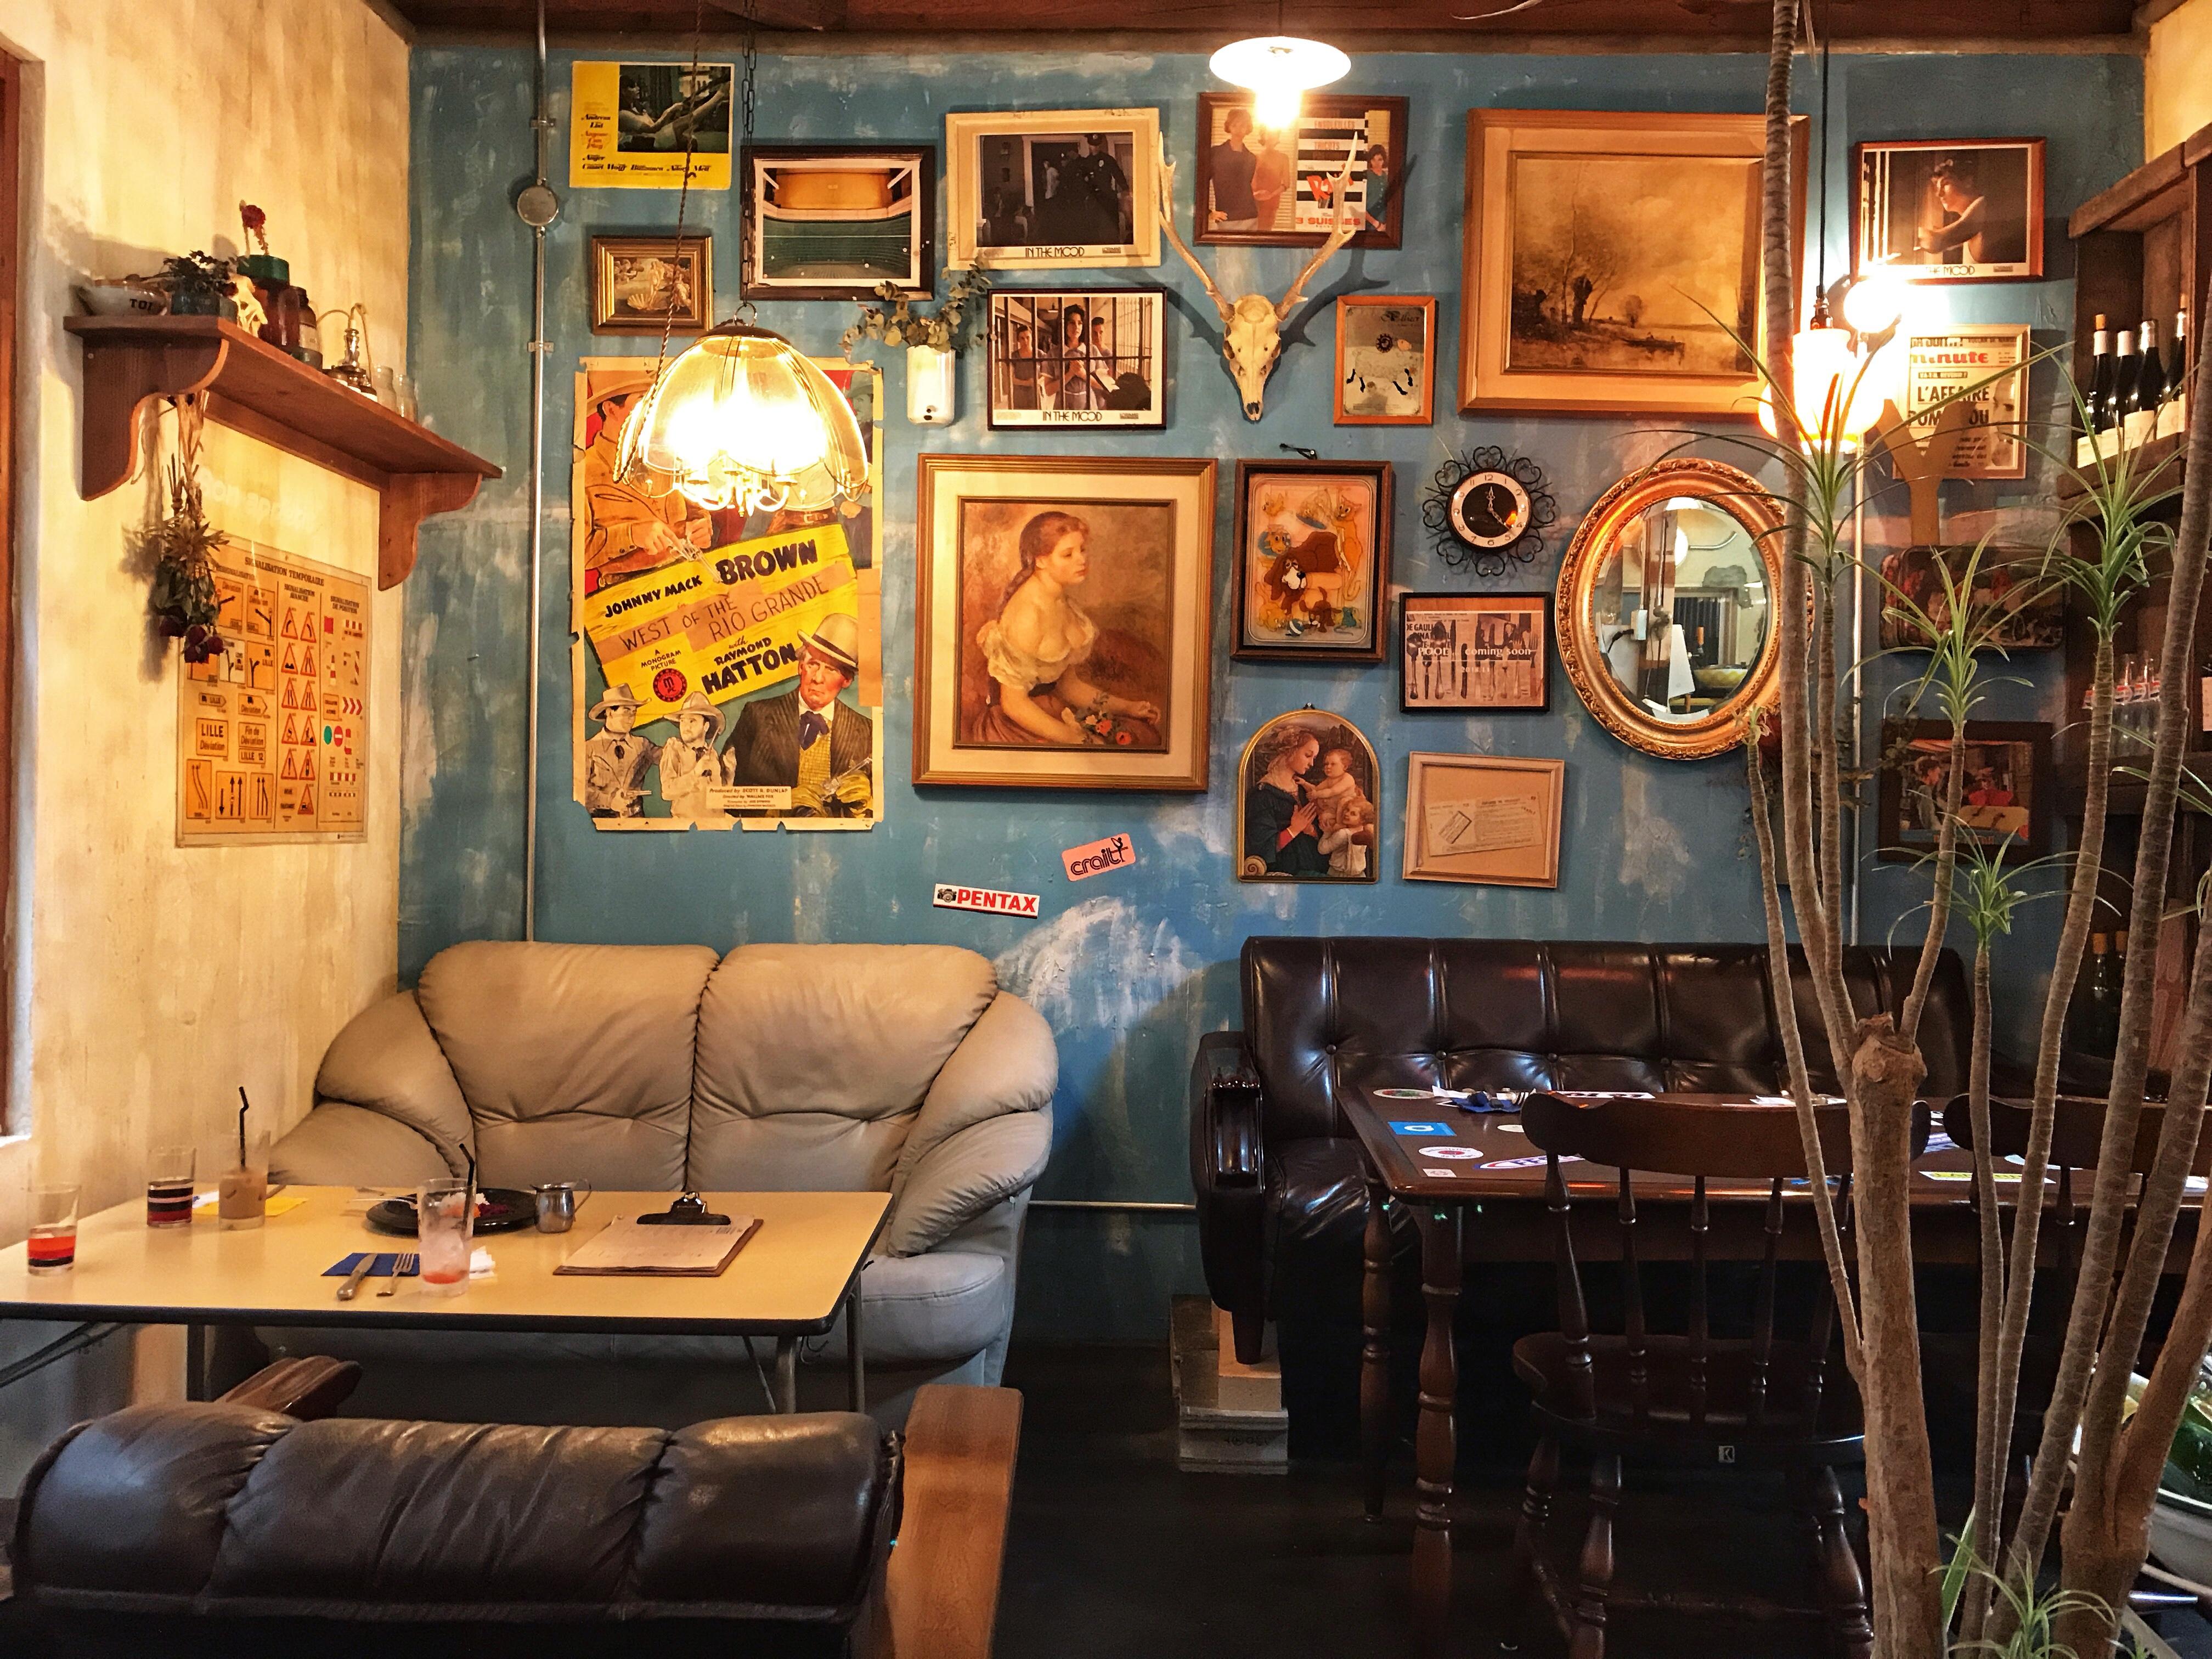 CAFE&RESTAURANT POOL 奈良市のオシャレカフェ カジュアルフレンチ